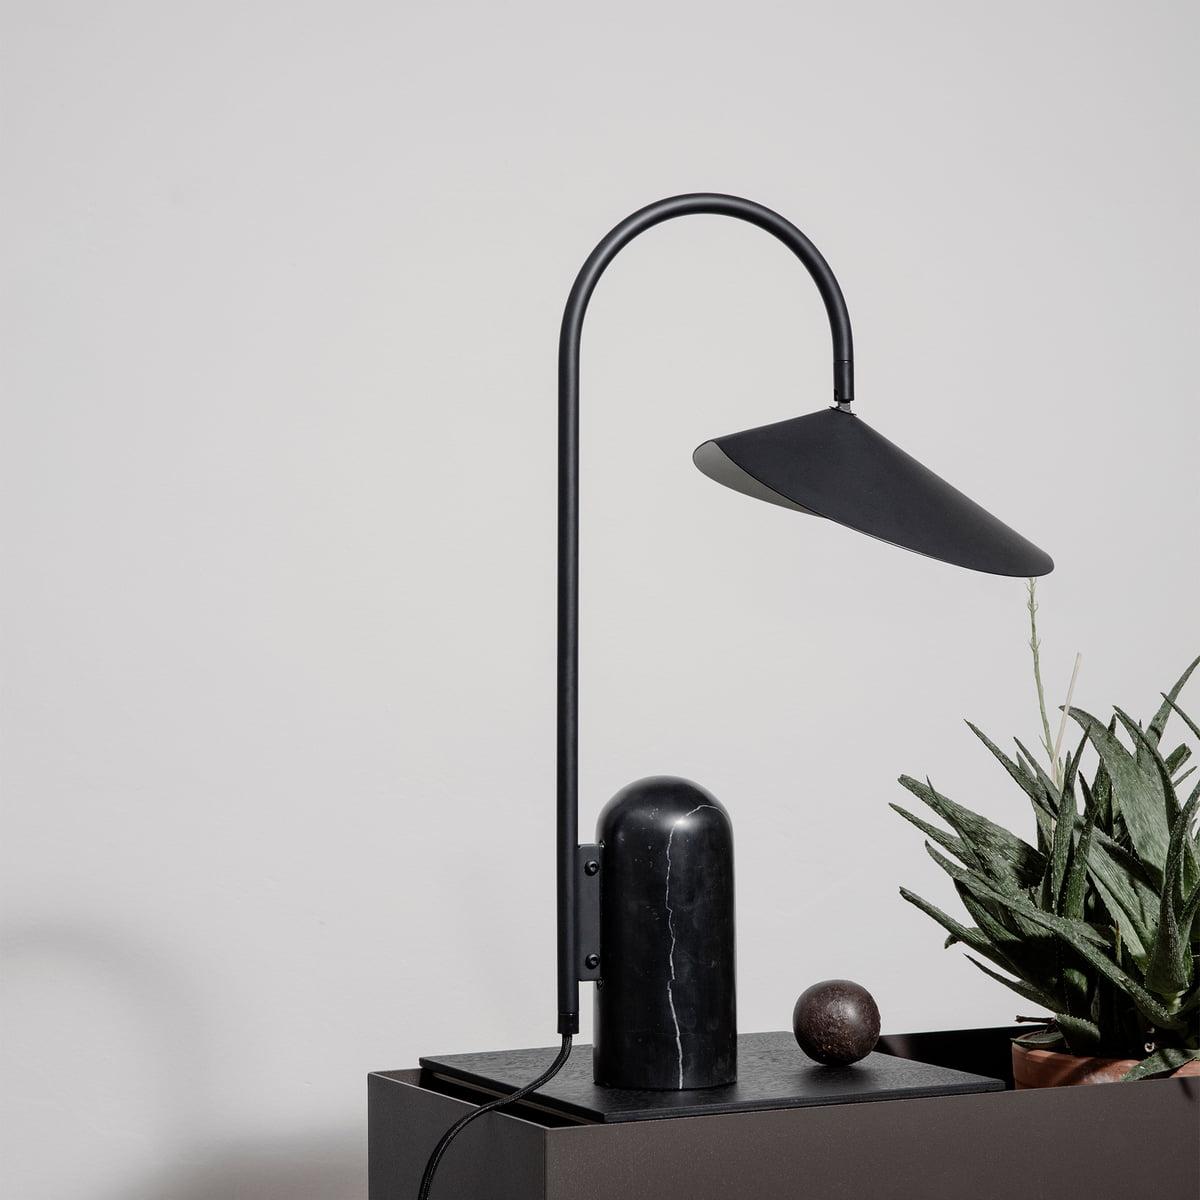 Living Lampe TableNoir Ferm De Arum NX0PnwO8k